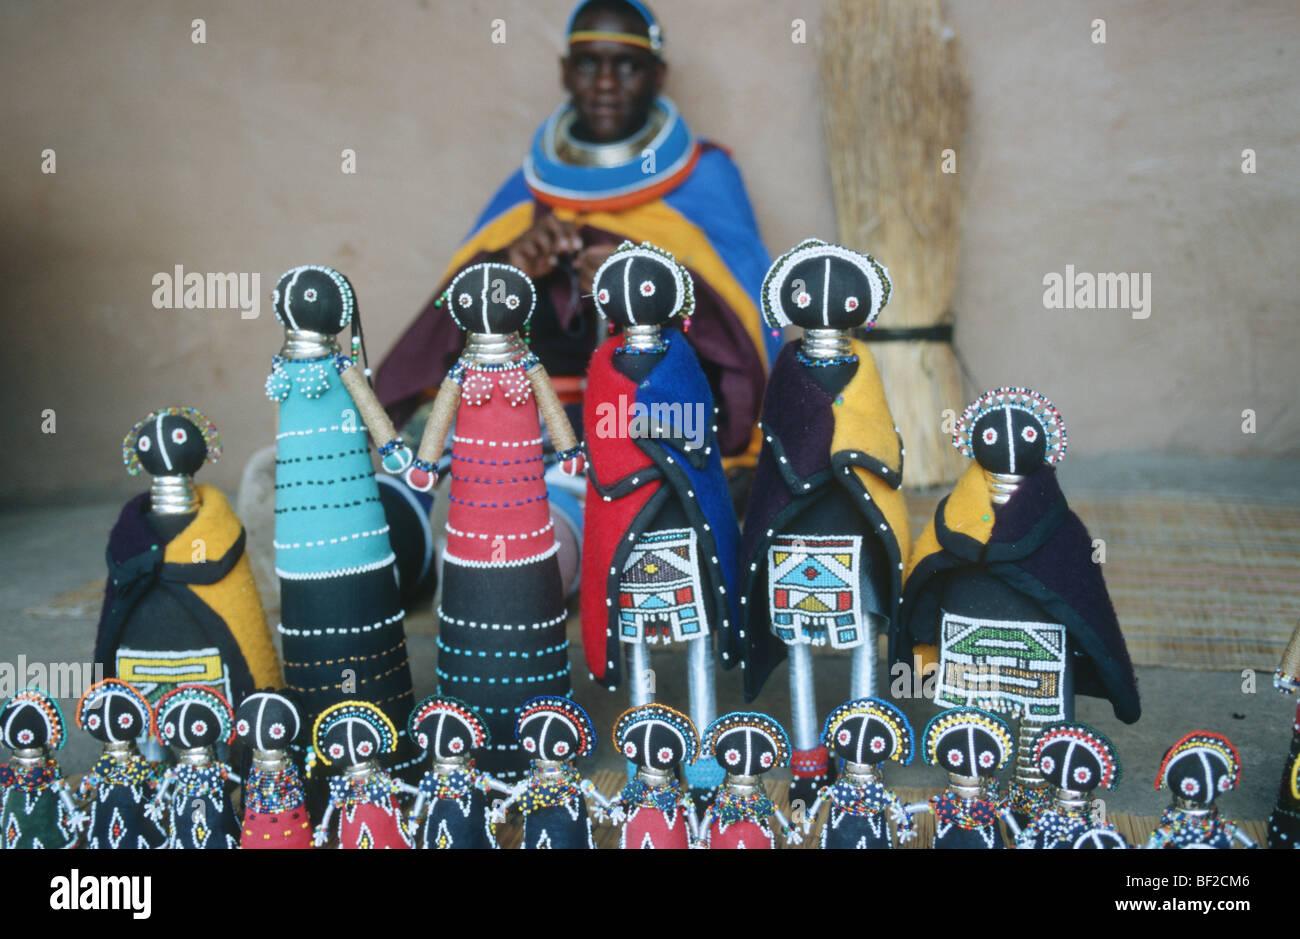 Traditionelle Perlenarbeiten Puppen, Nordwest-Provinz, Südafrika Stockbild